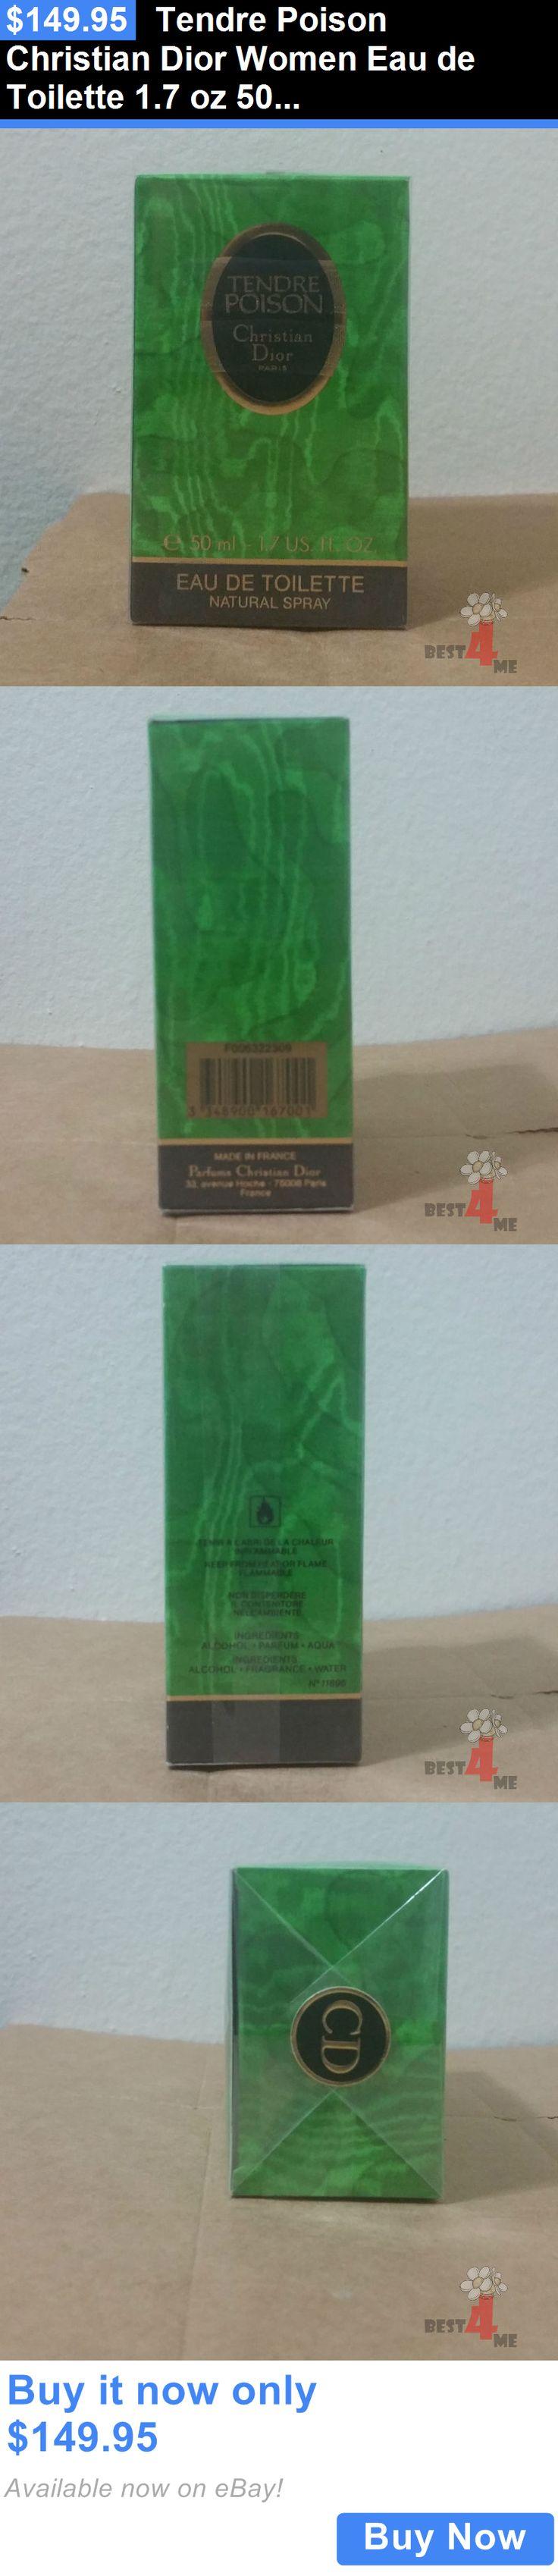 Women Fragrance: Tendre Poison Christian Dior Women Eau De Toilette 1.7 Oz 50 Ml Spray Rare! BUY IT NOW ONLY: $149.95